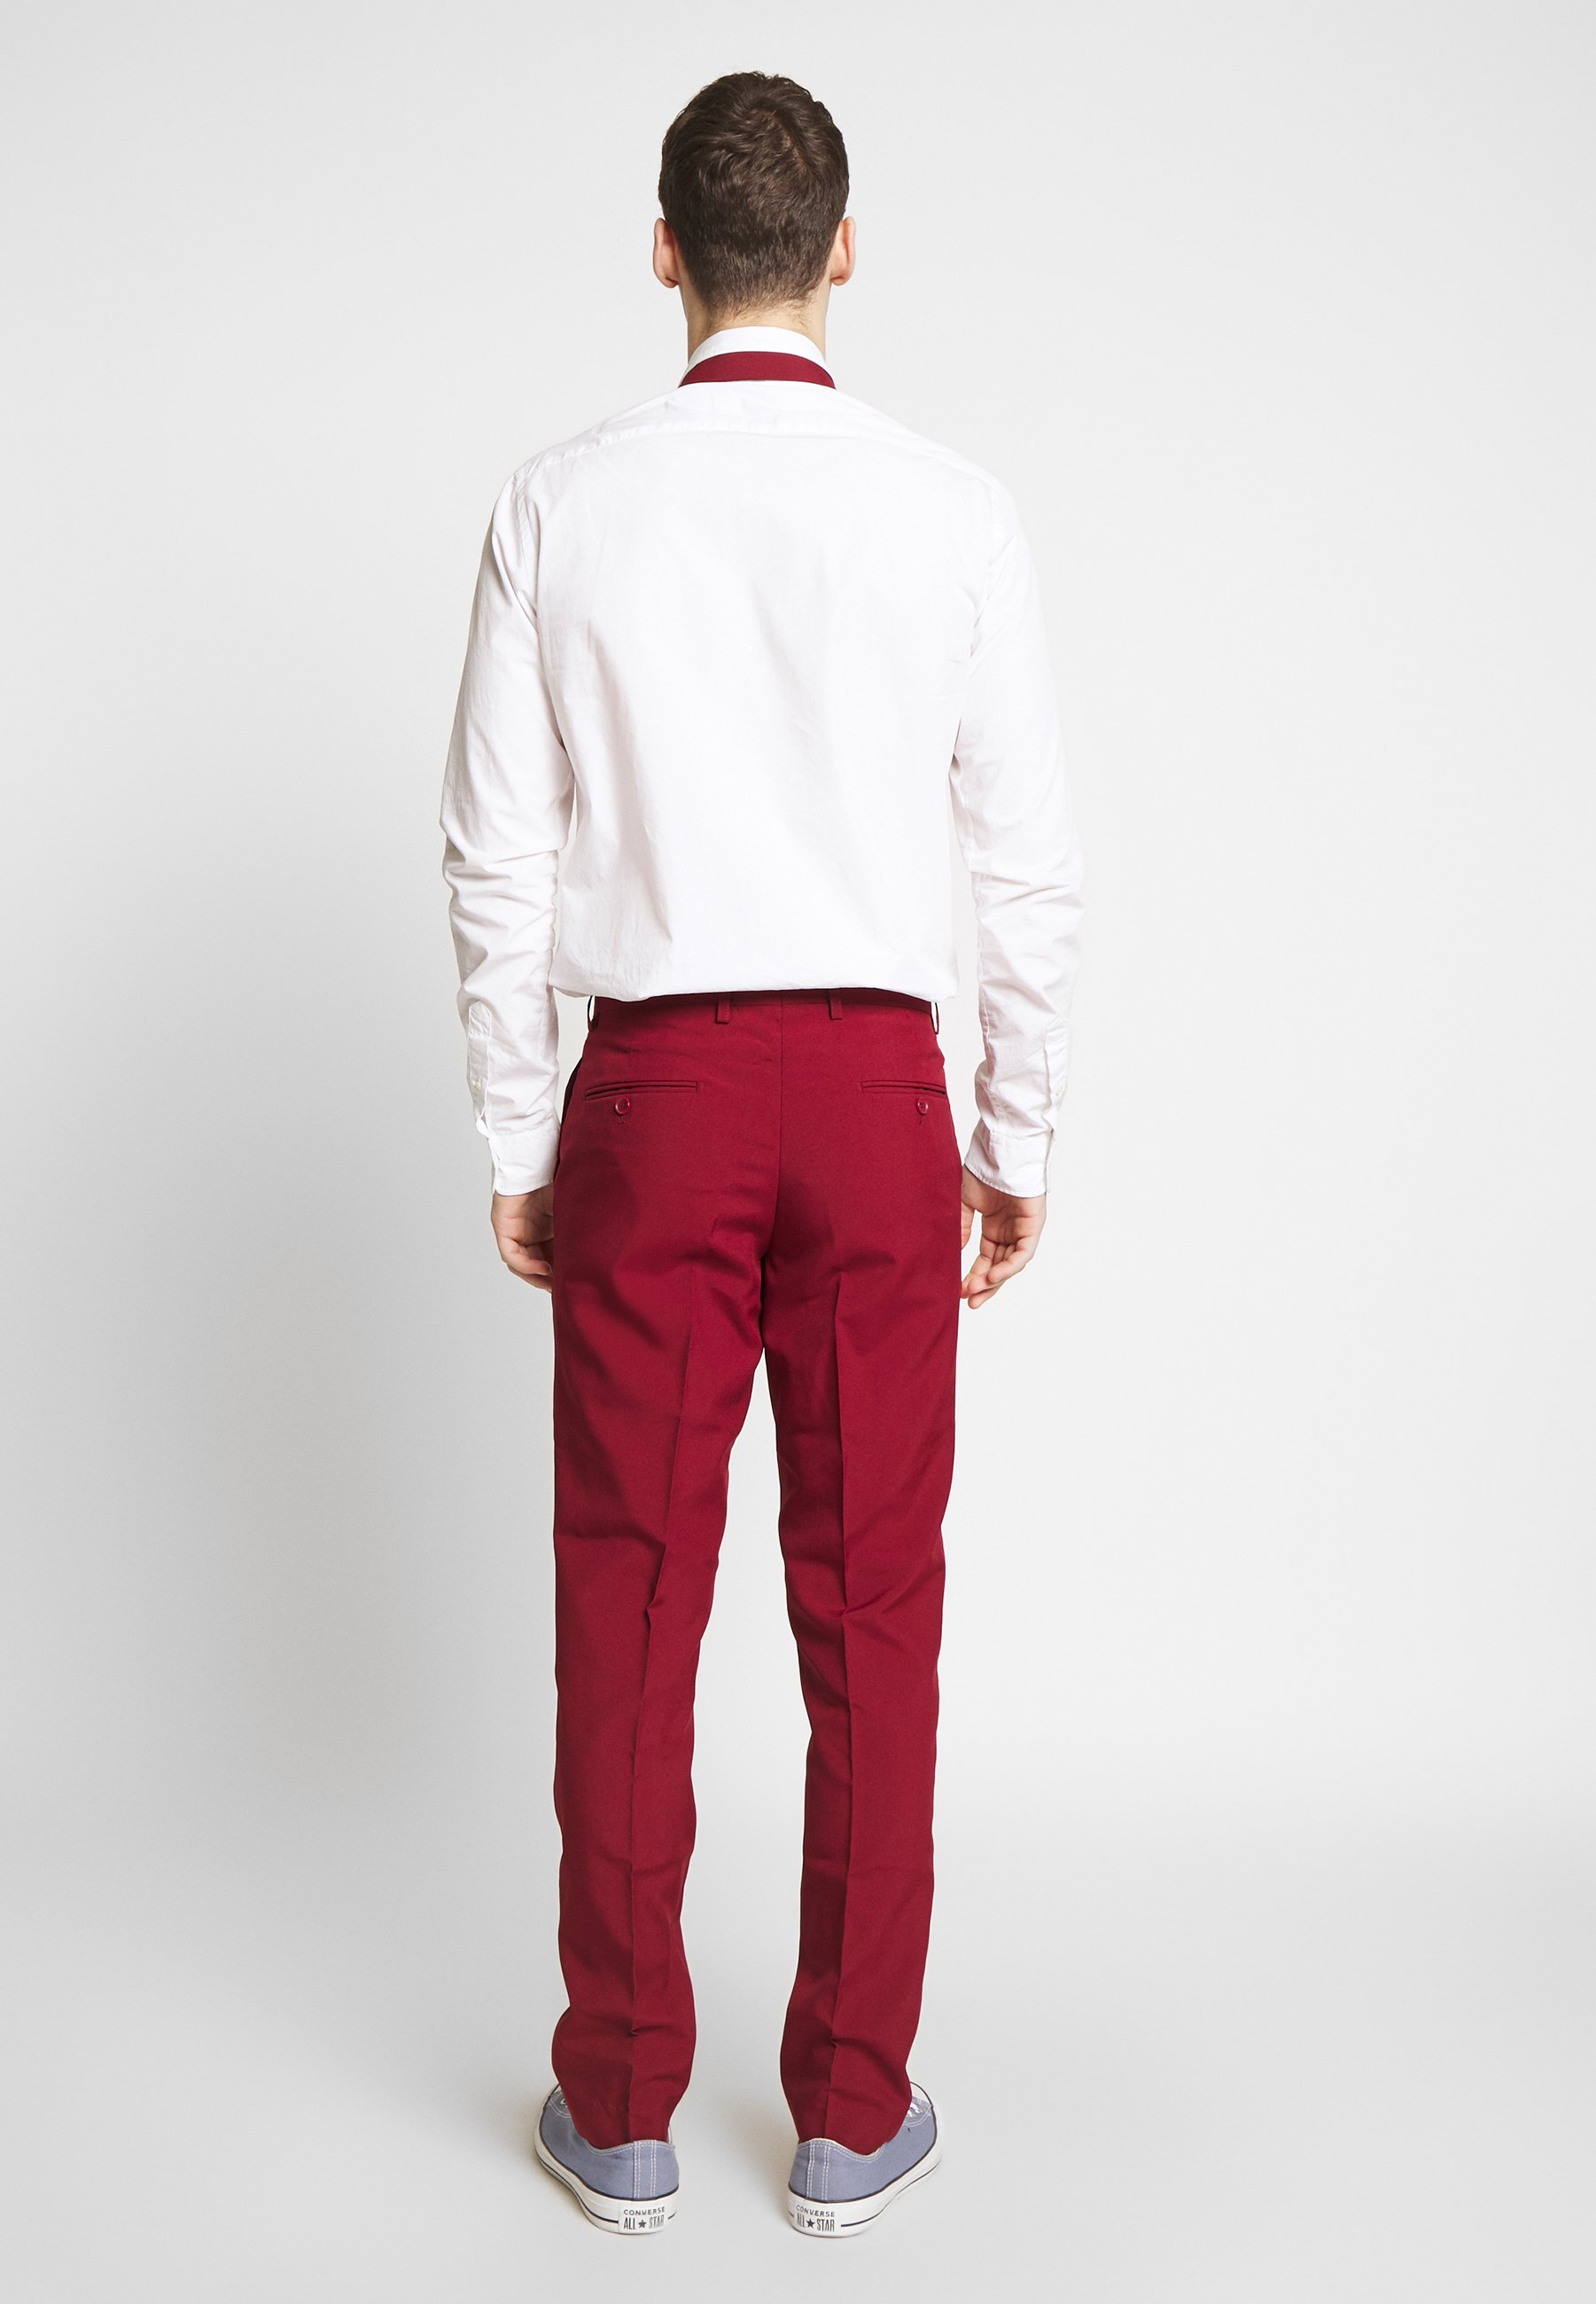 OppoSuits BLAZING - Garnitur - bordeaux - Odzież męska 2020